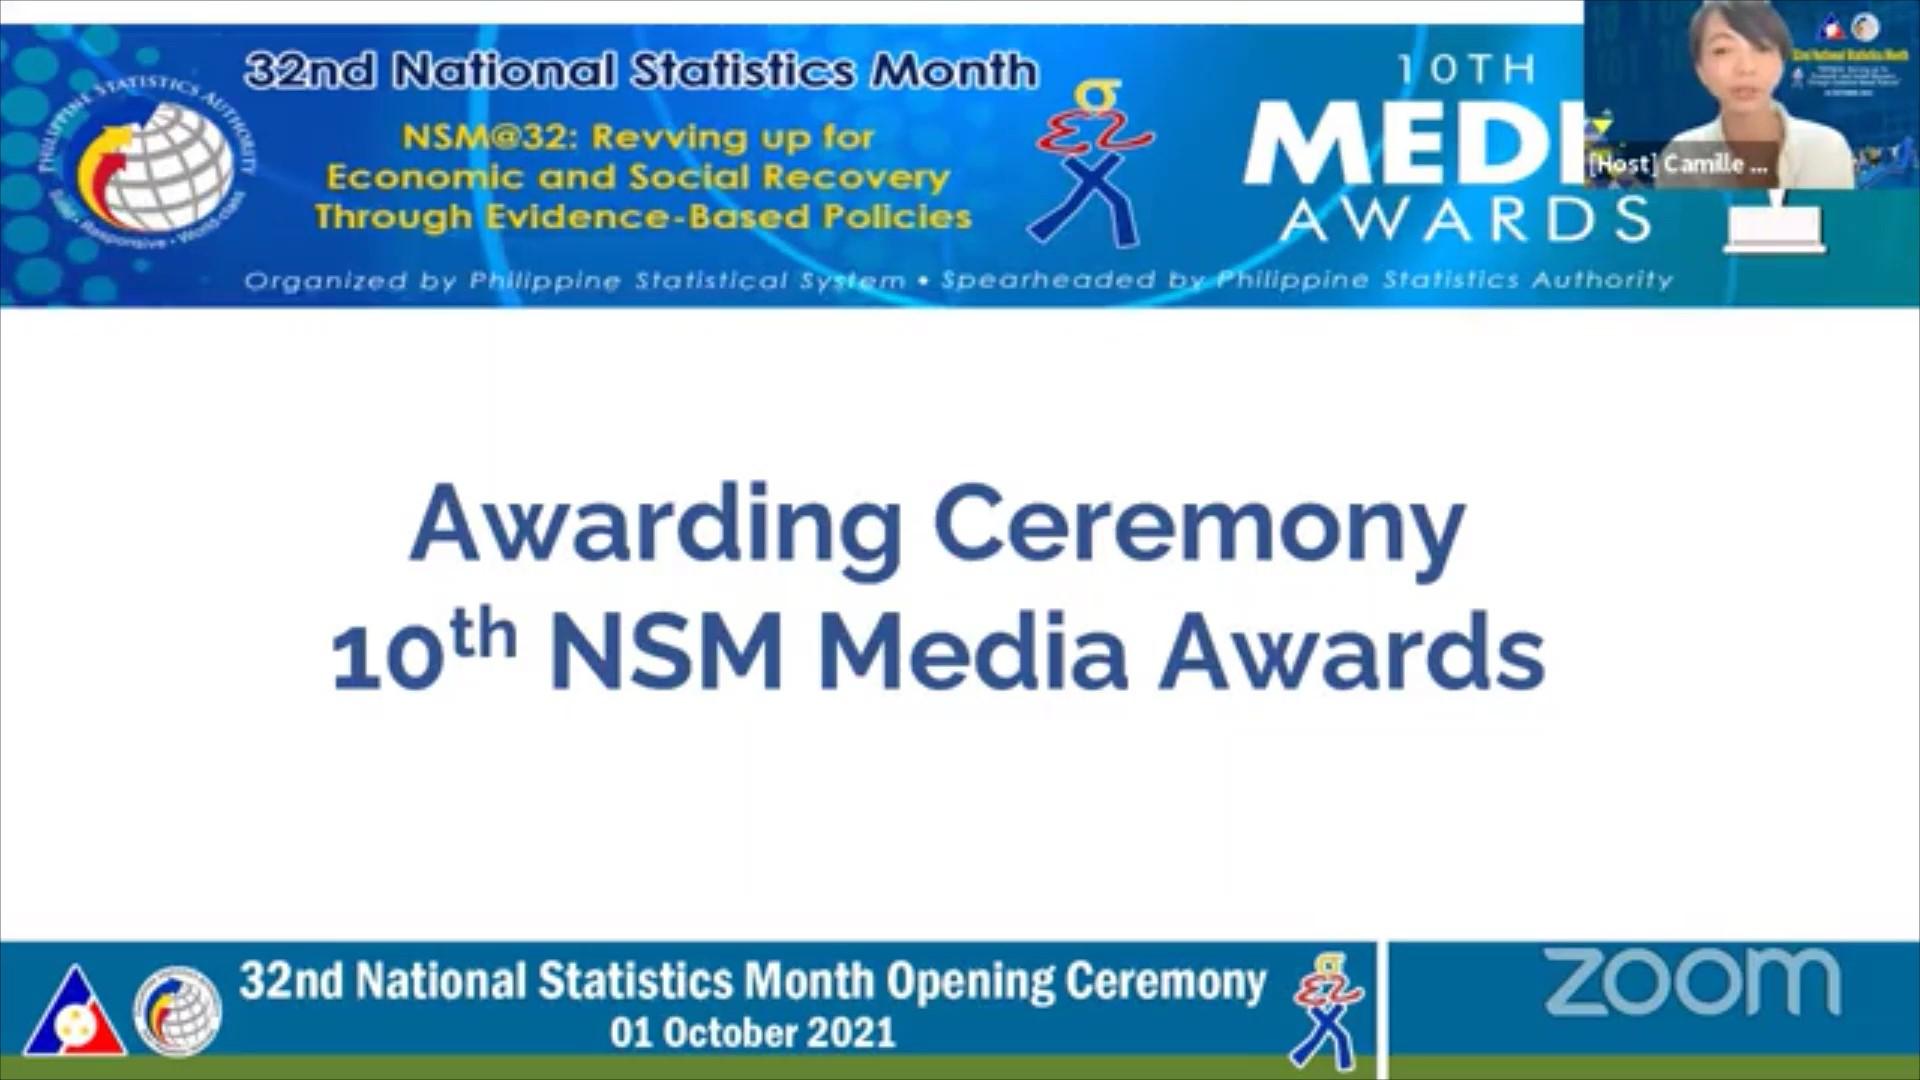 10th NSM Media Awards: Announcement of Winners